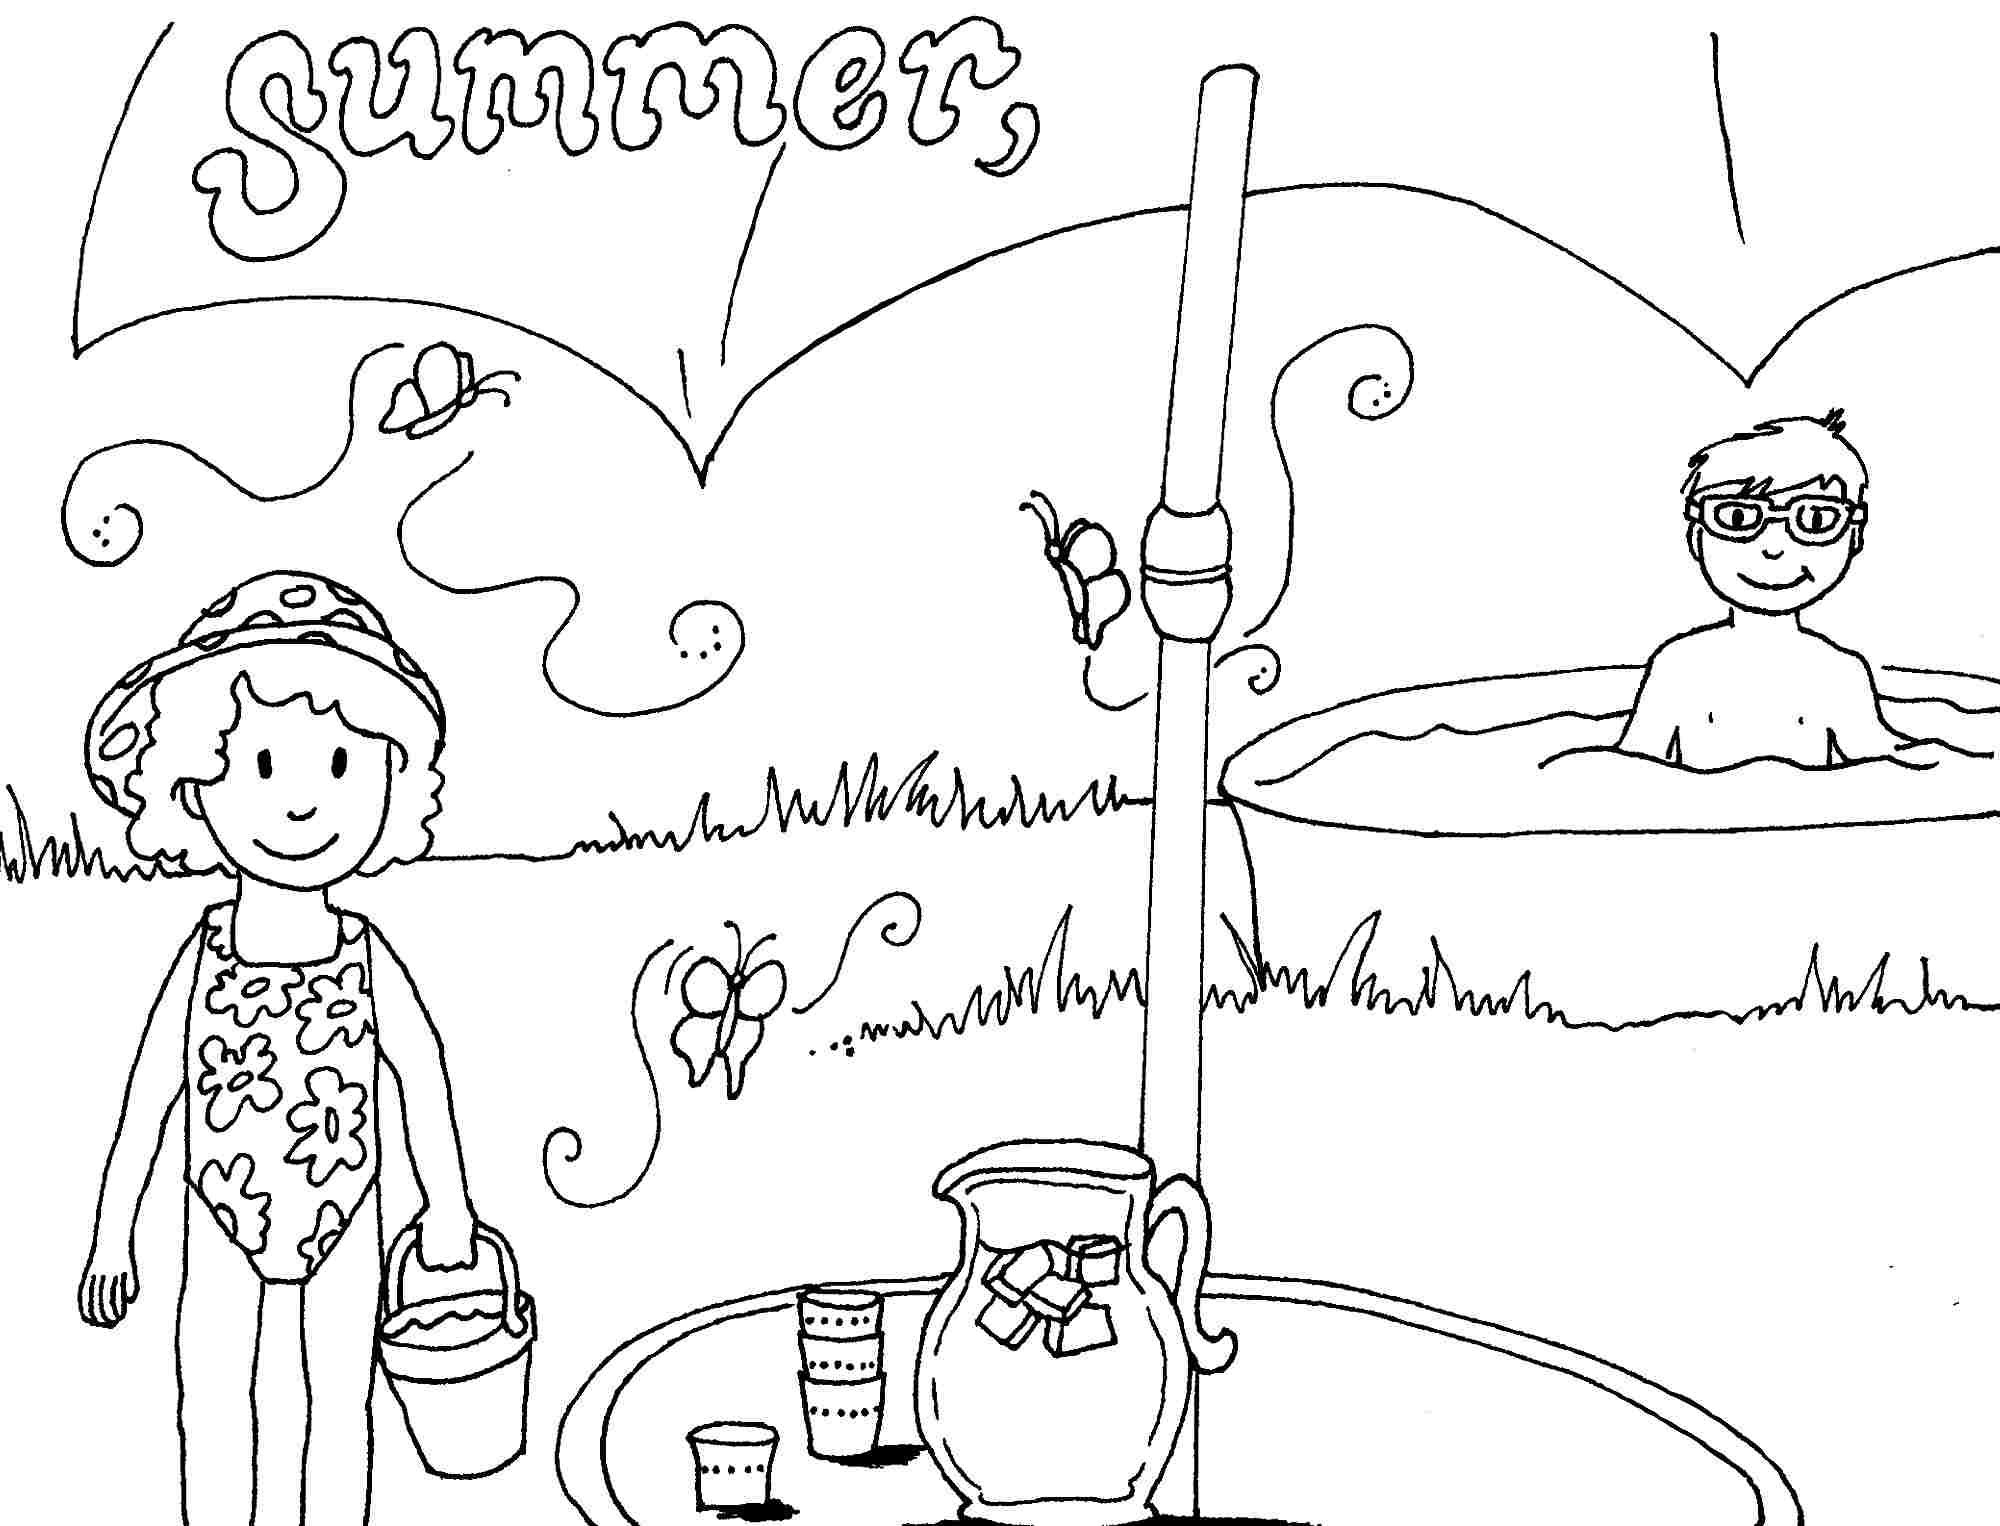 Summer Season Sketch At Paintingvalley